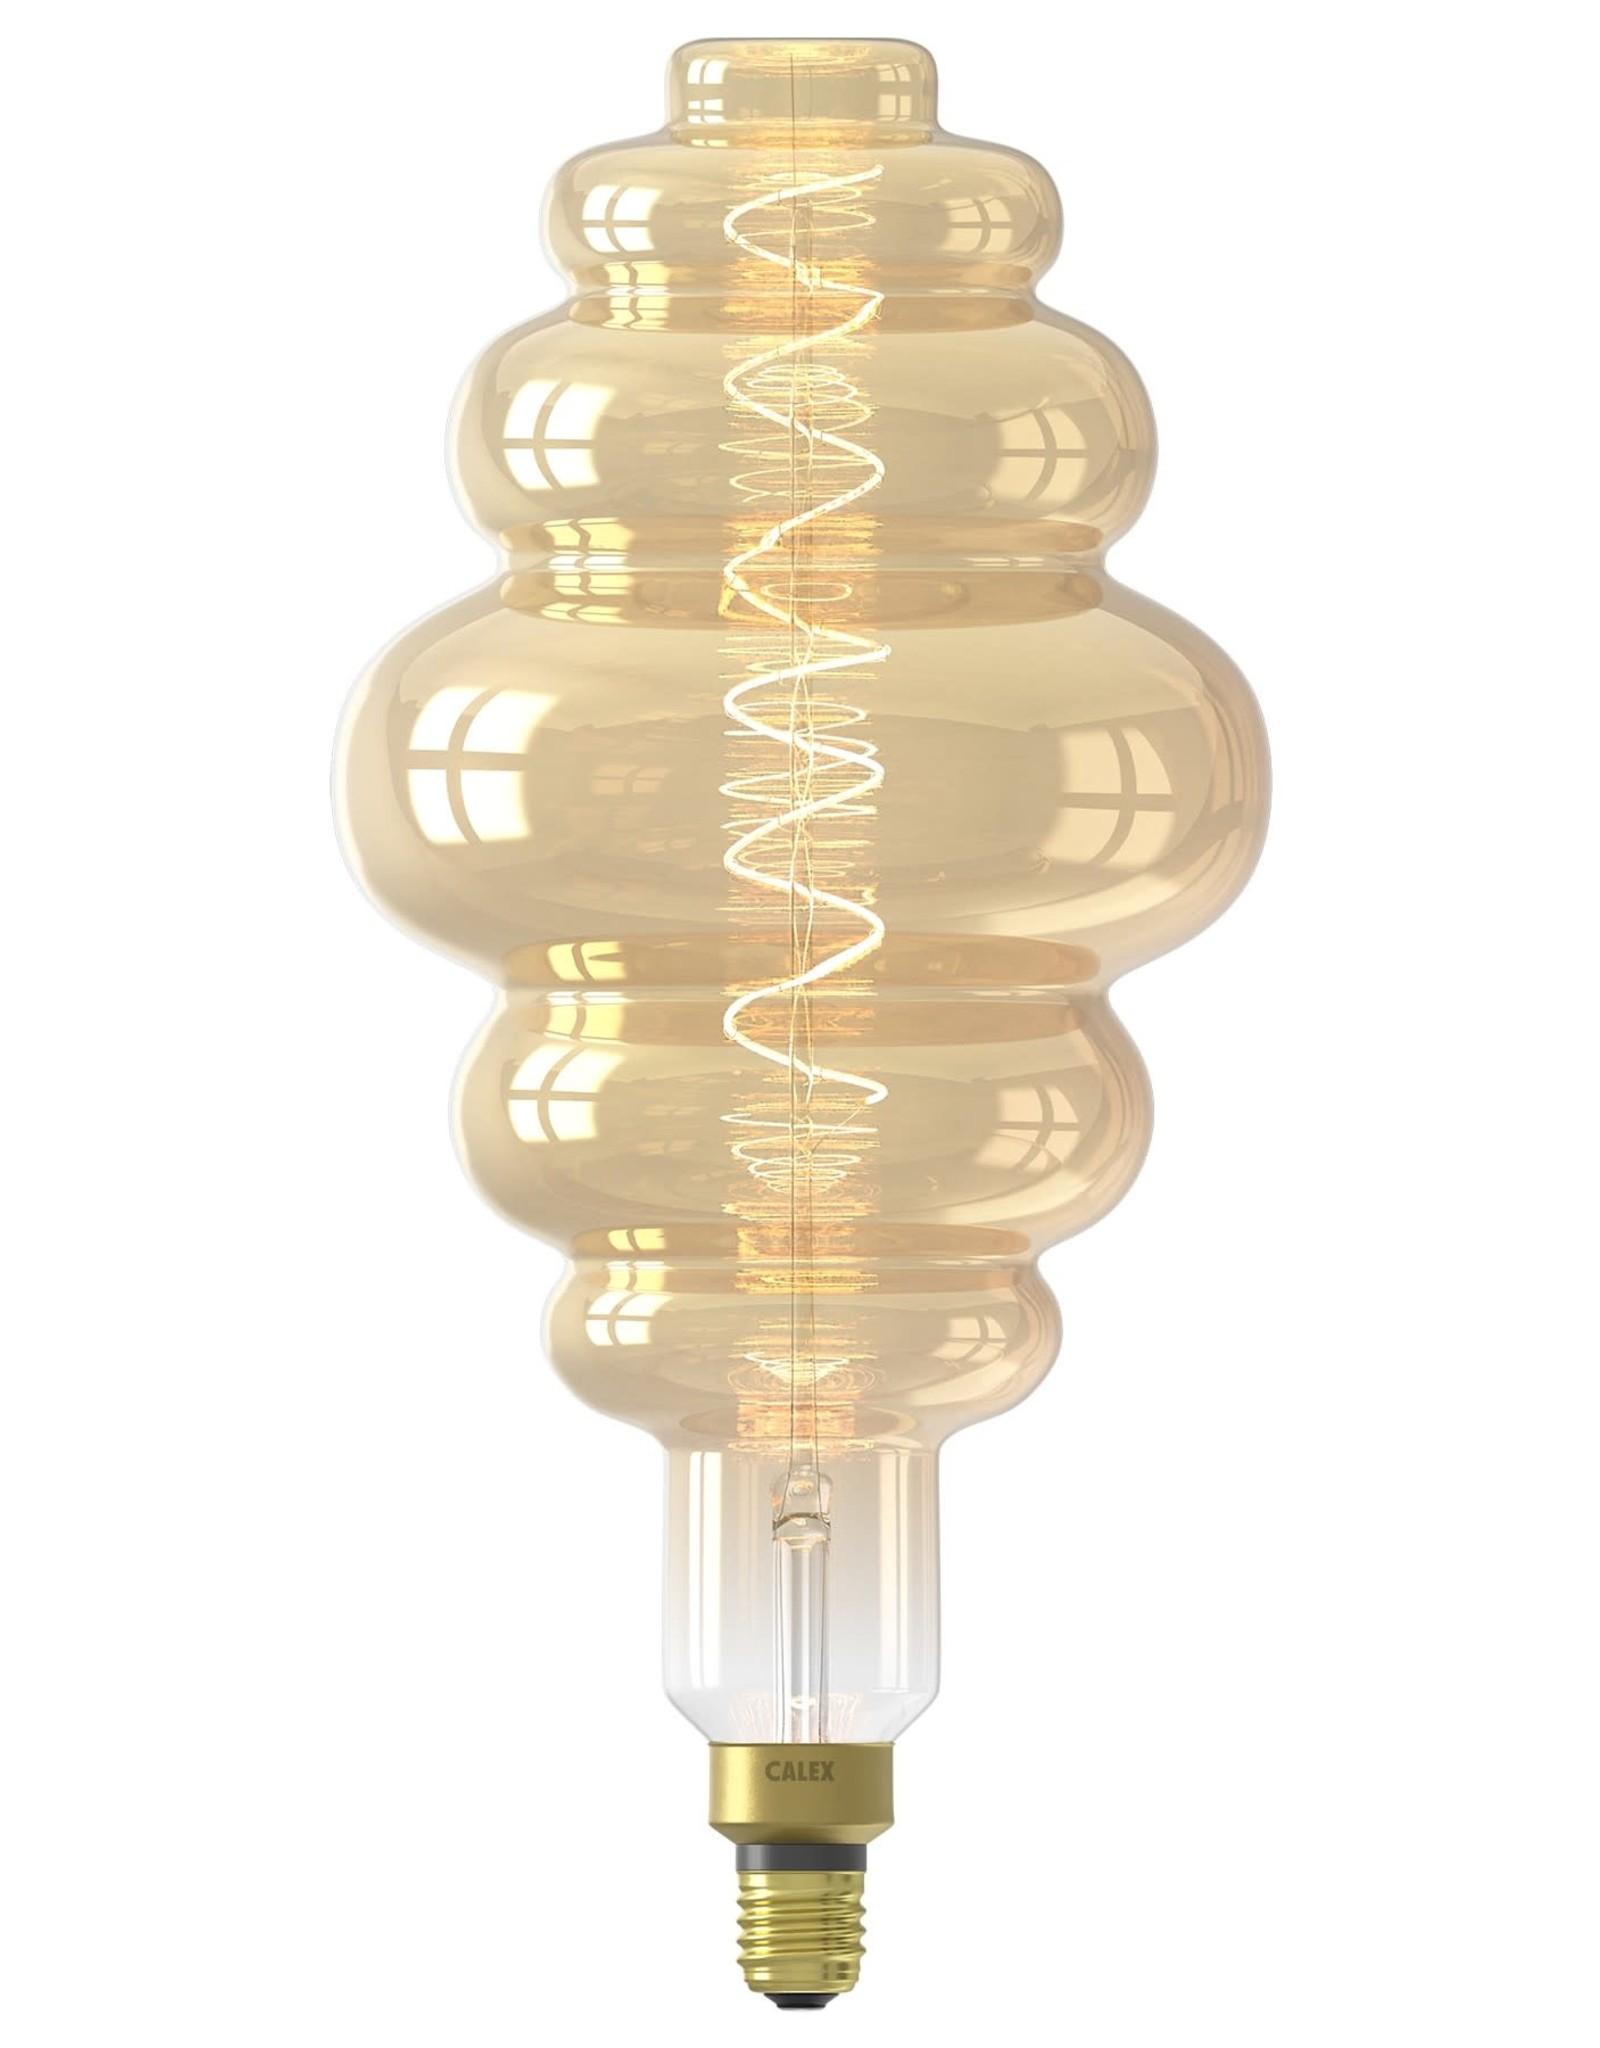 Calex XXL Paris LED Lamp 220-240V 6W 350lm E27 LS200, Gold 2200K dimmable, energy label A